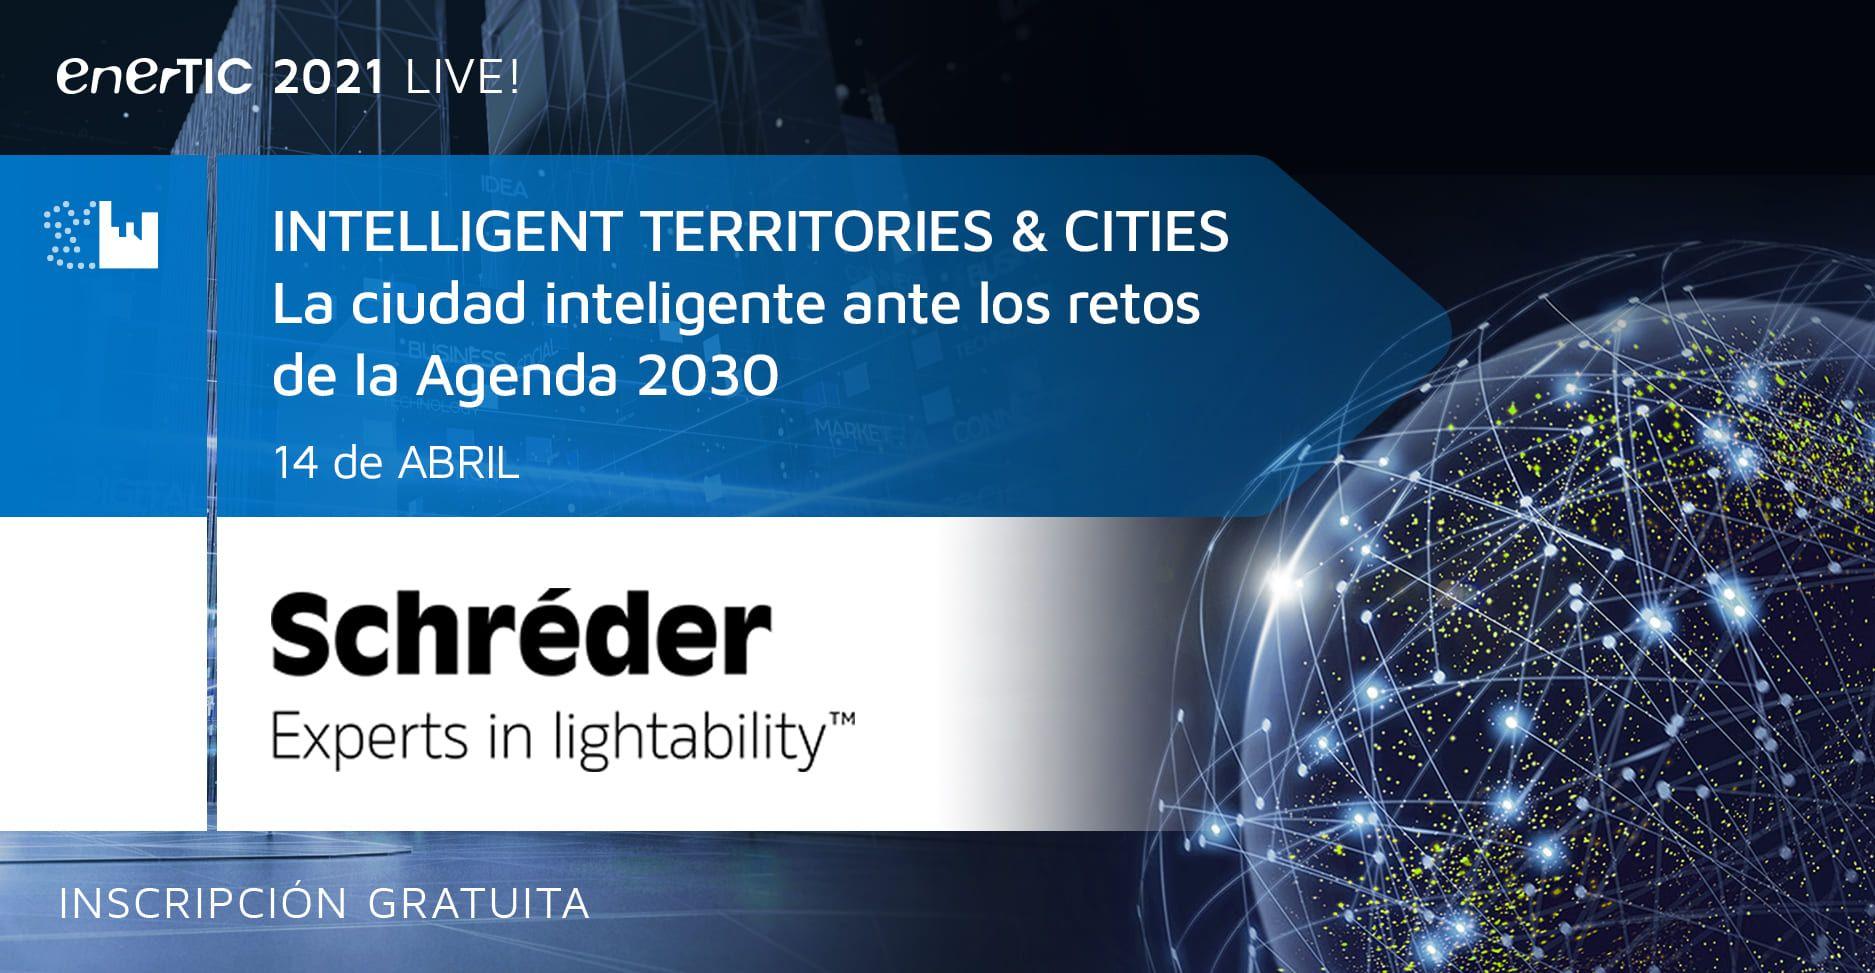 Schréder participa en el Foro intelligent Territories & Cities